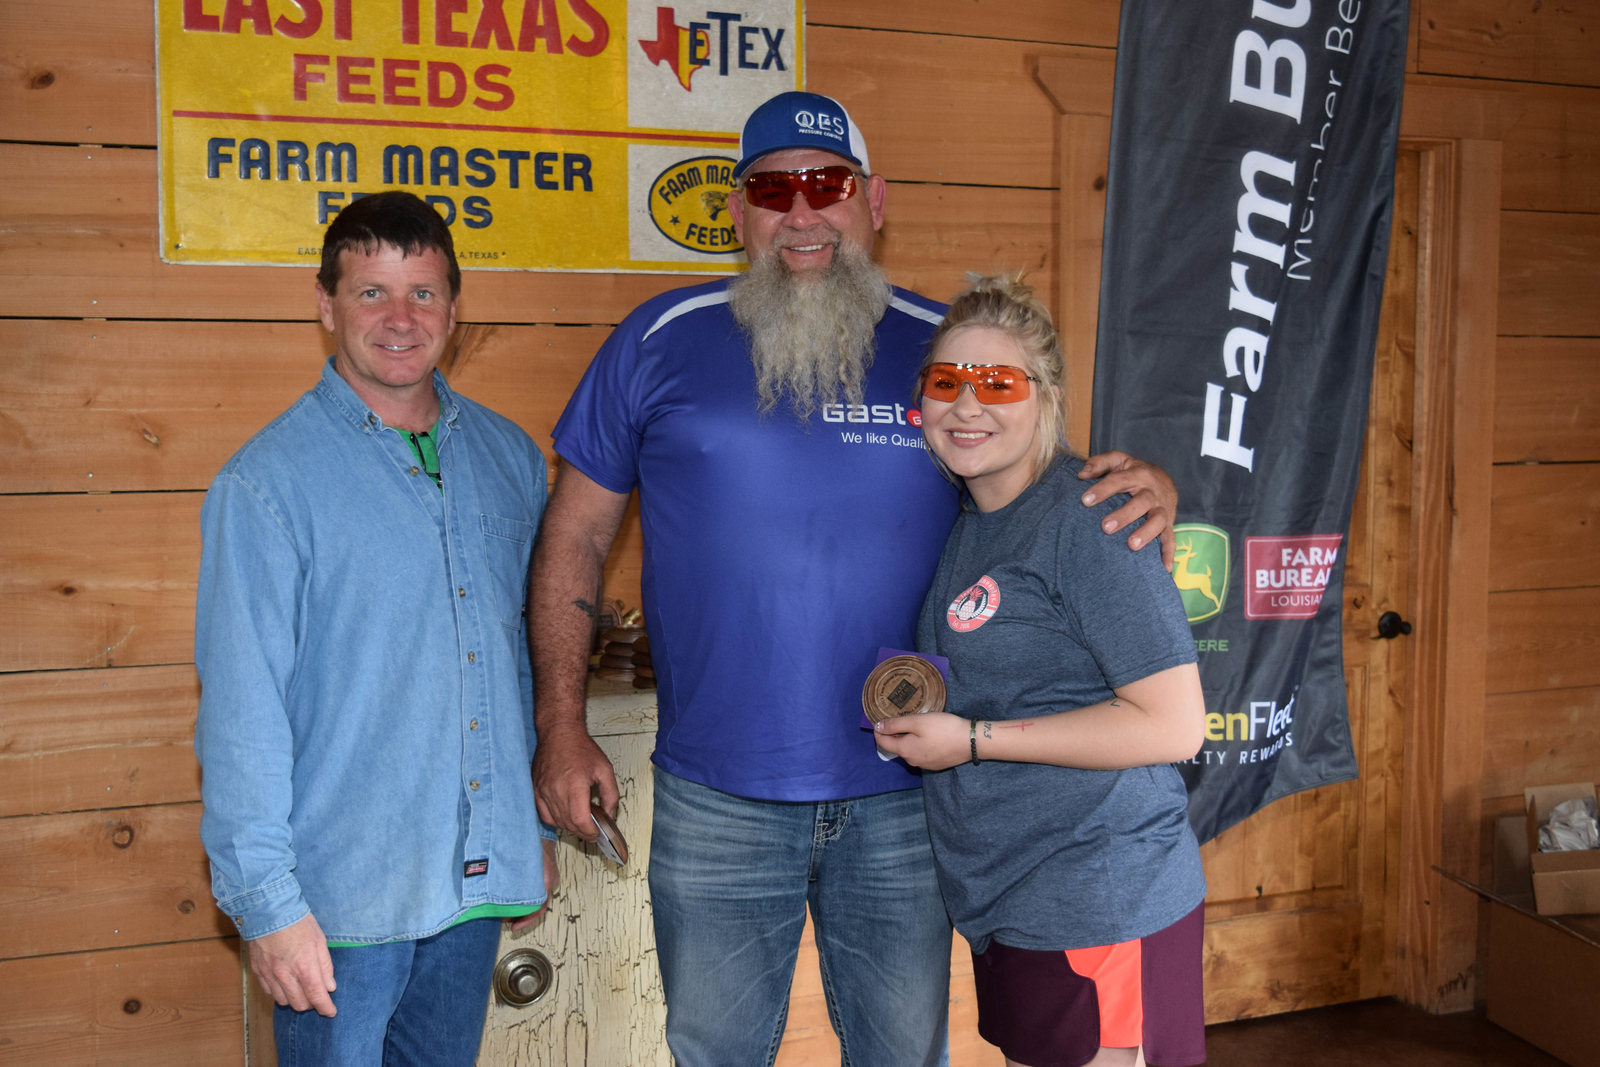 Tristen Owens, right, won 3rd place Adult Shooter and Dwayne Owens won 2nd place Adult Shooter at the 2018 Louisiana Farm Bureau Sporting Clays Shootout. Pictured them is Louisiana Farm Bureau DeSoto Parish President Joey Register.